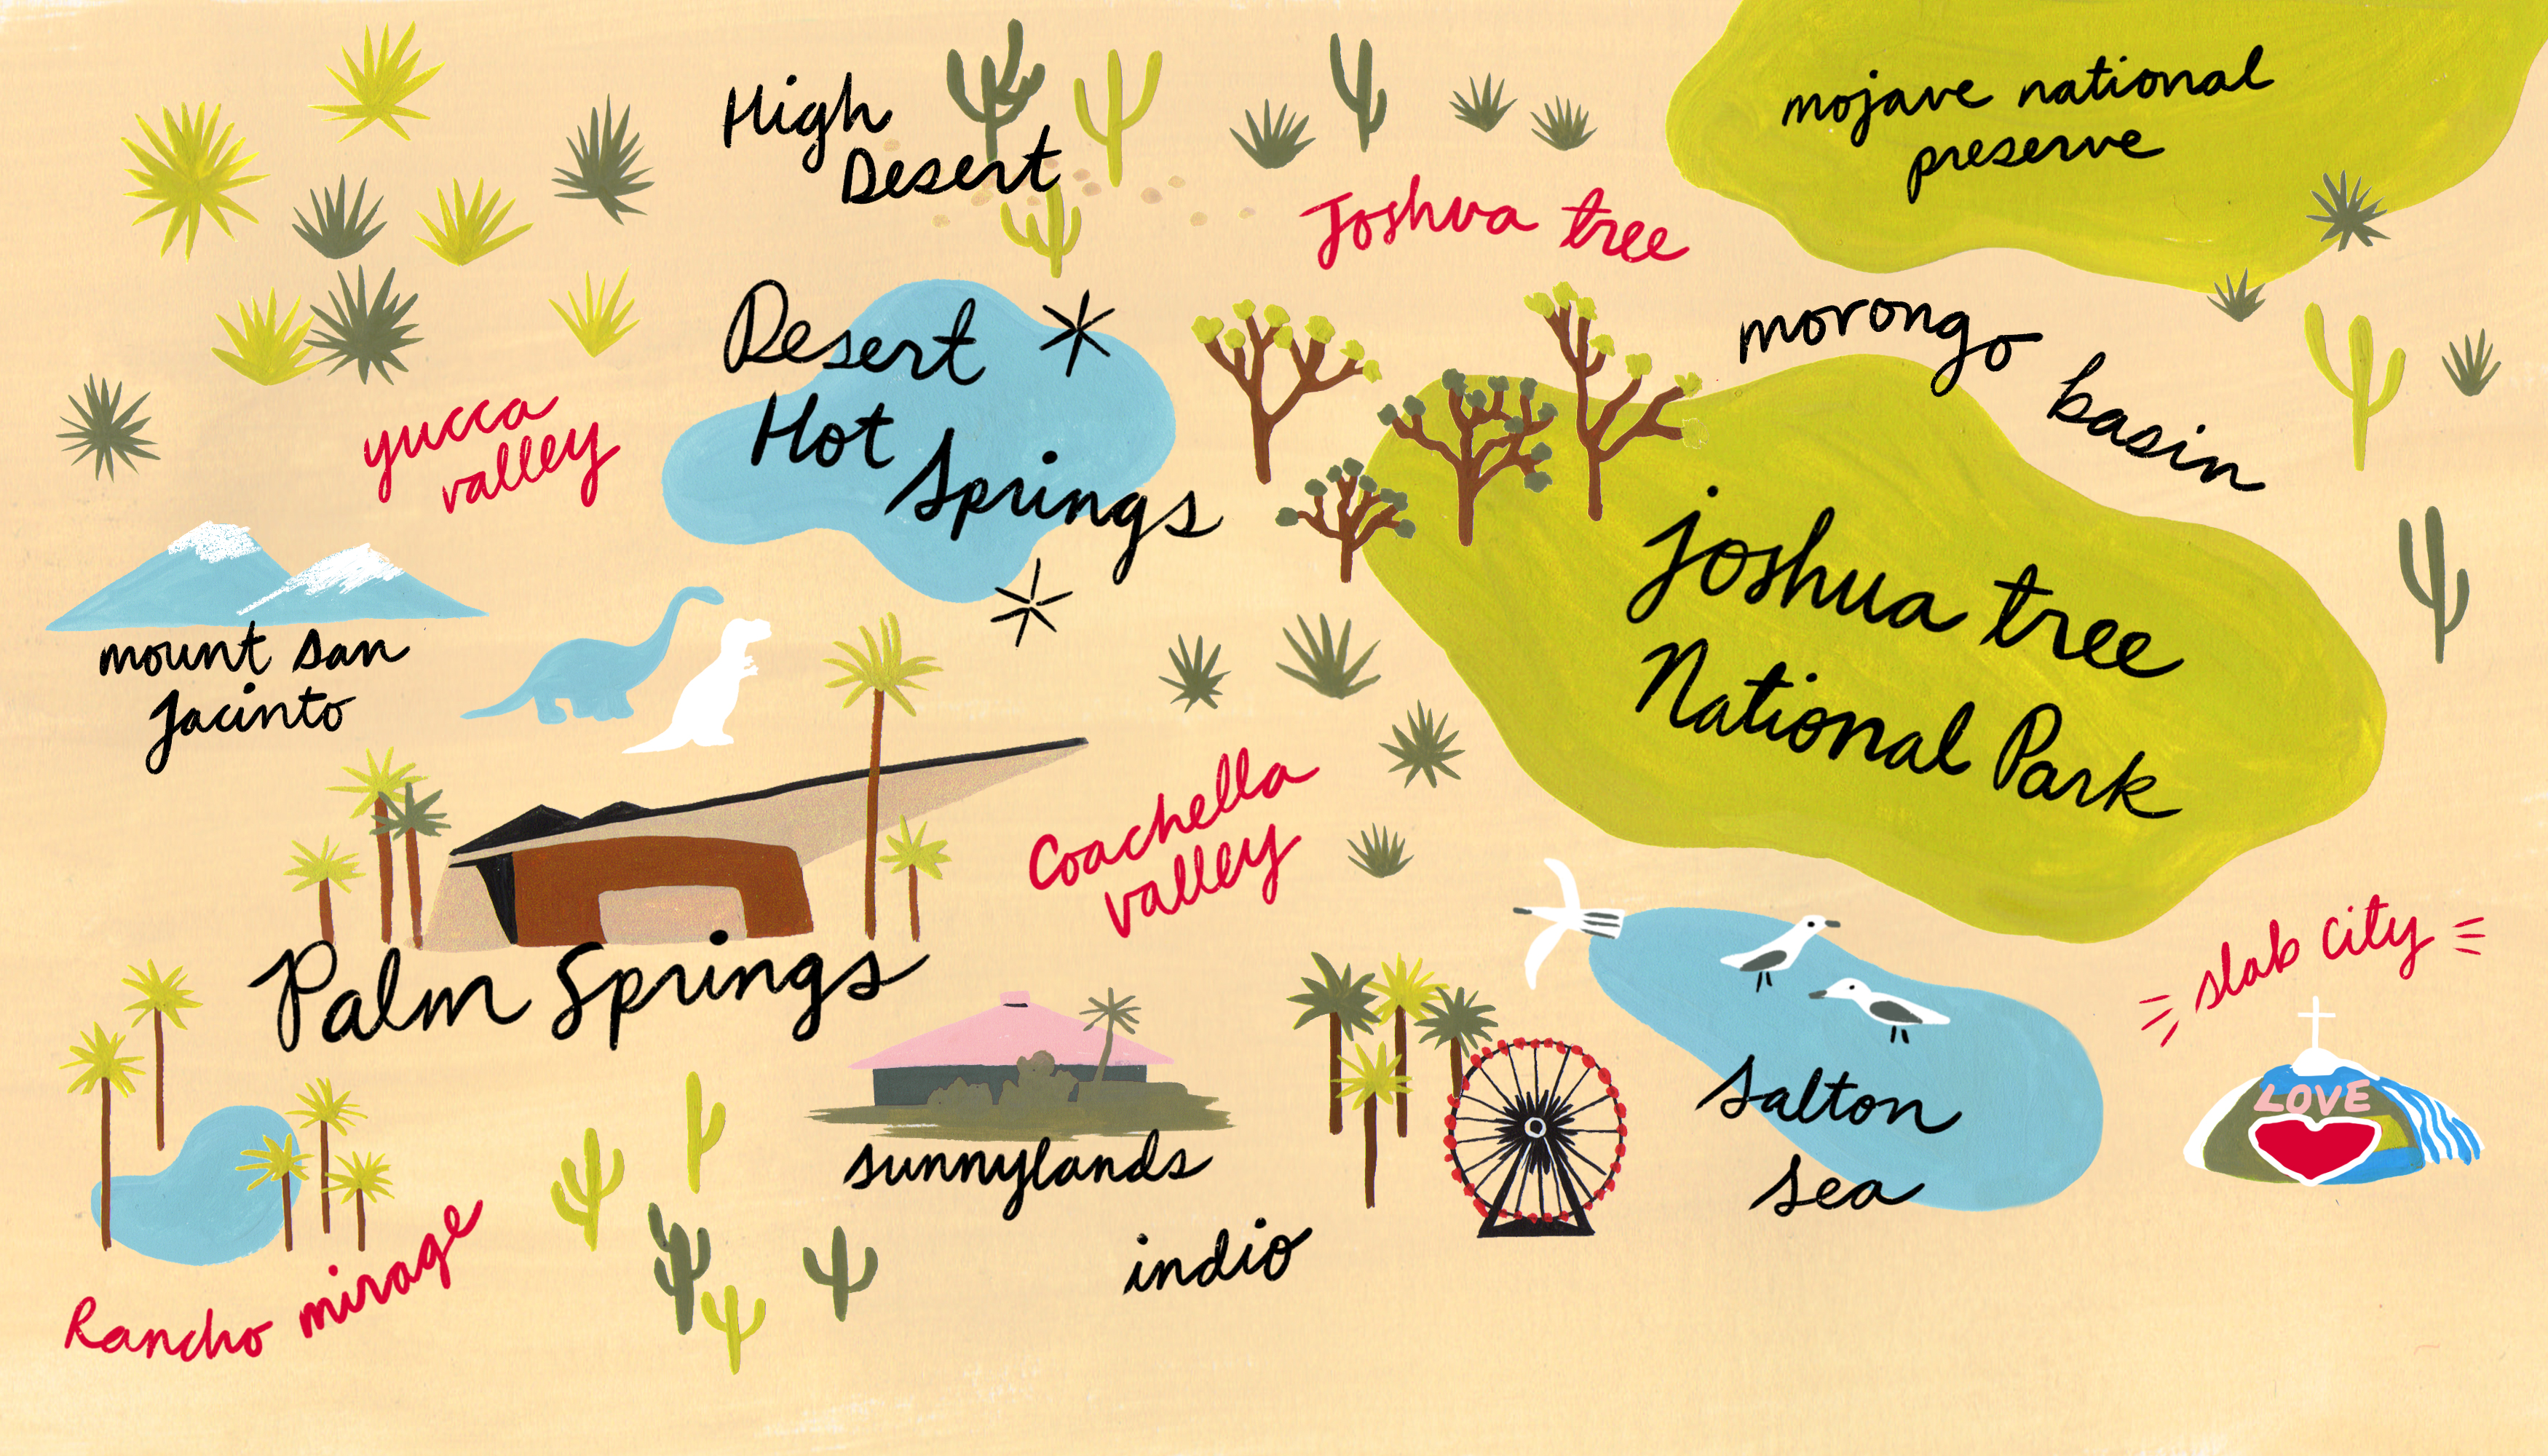 21 things to do in the California desert